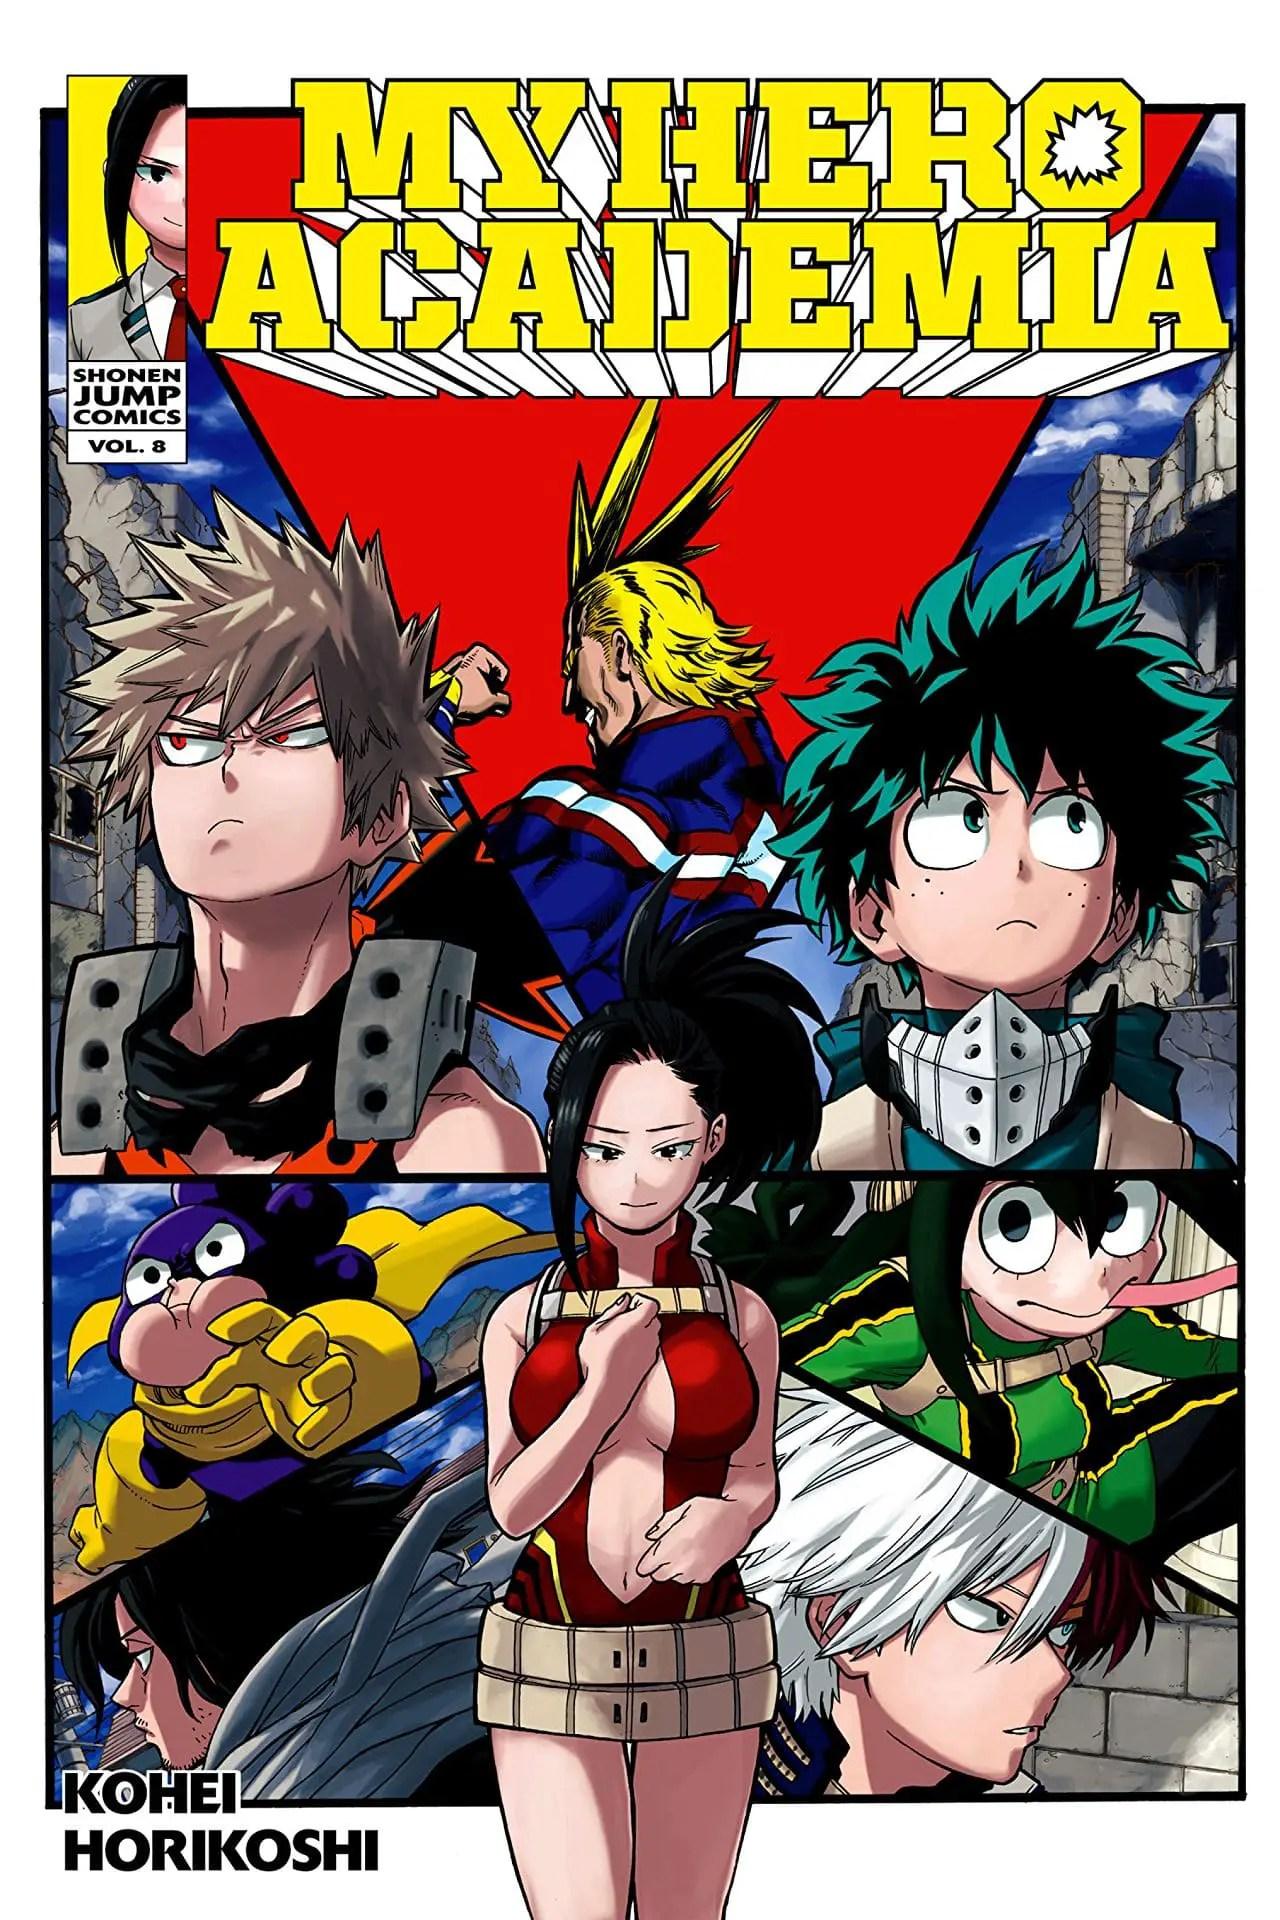 My Hero Academia Vol. 8 Review